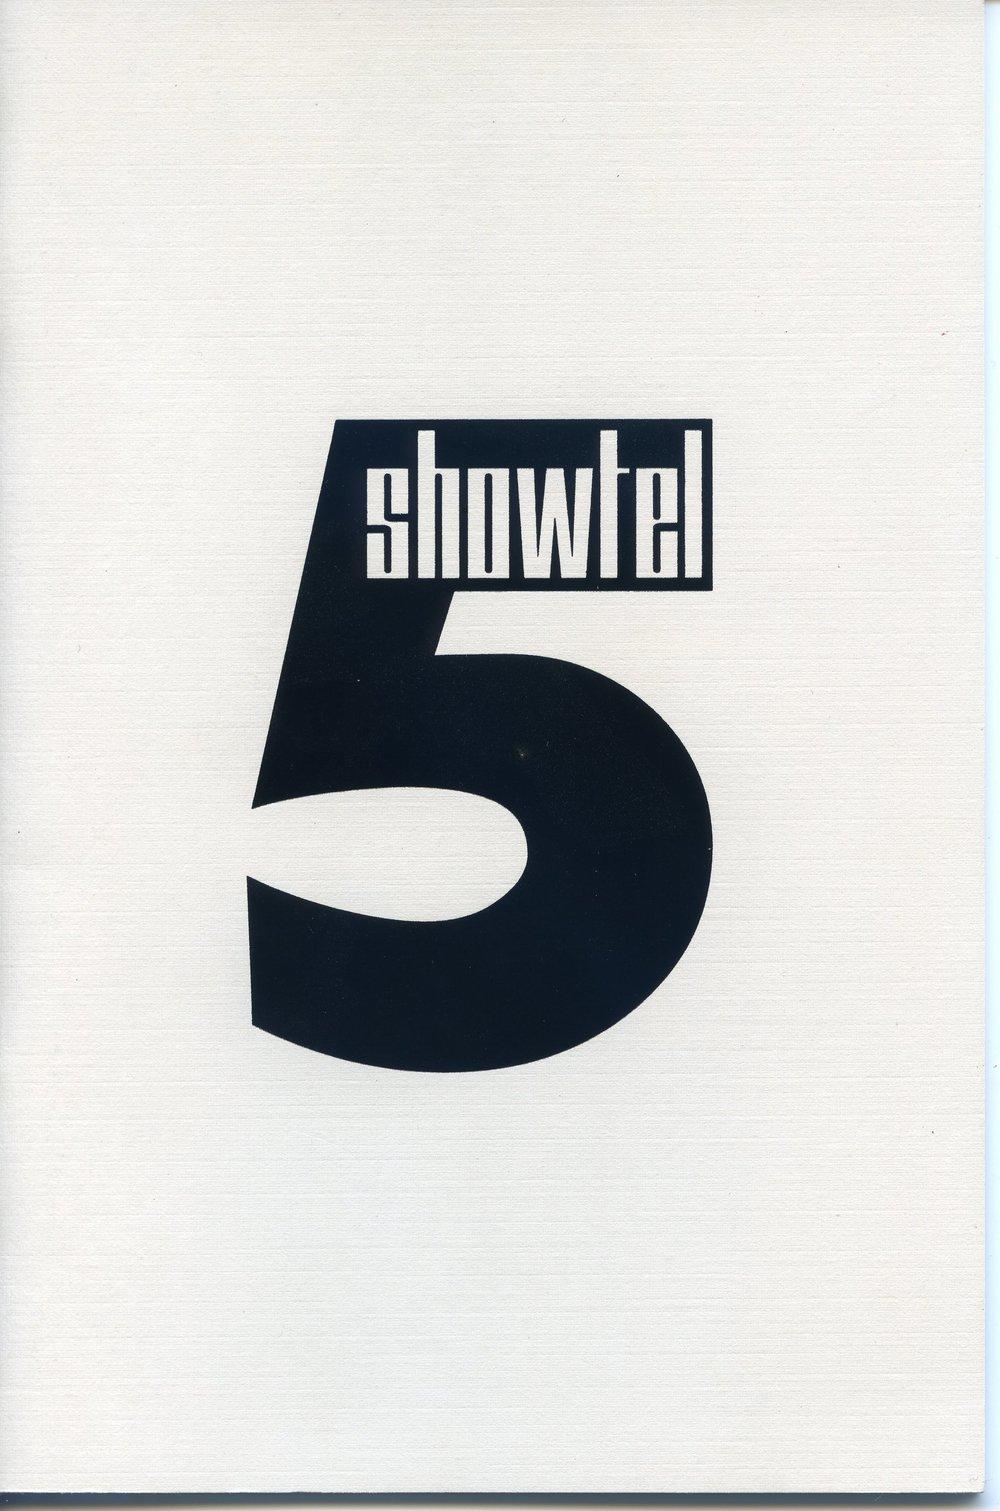 Showtel  2005